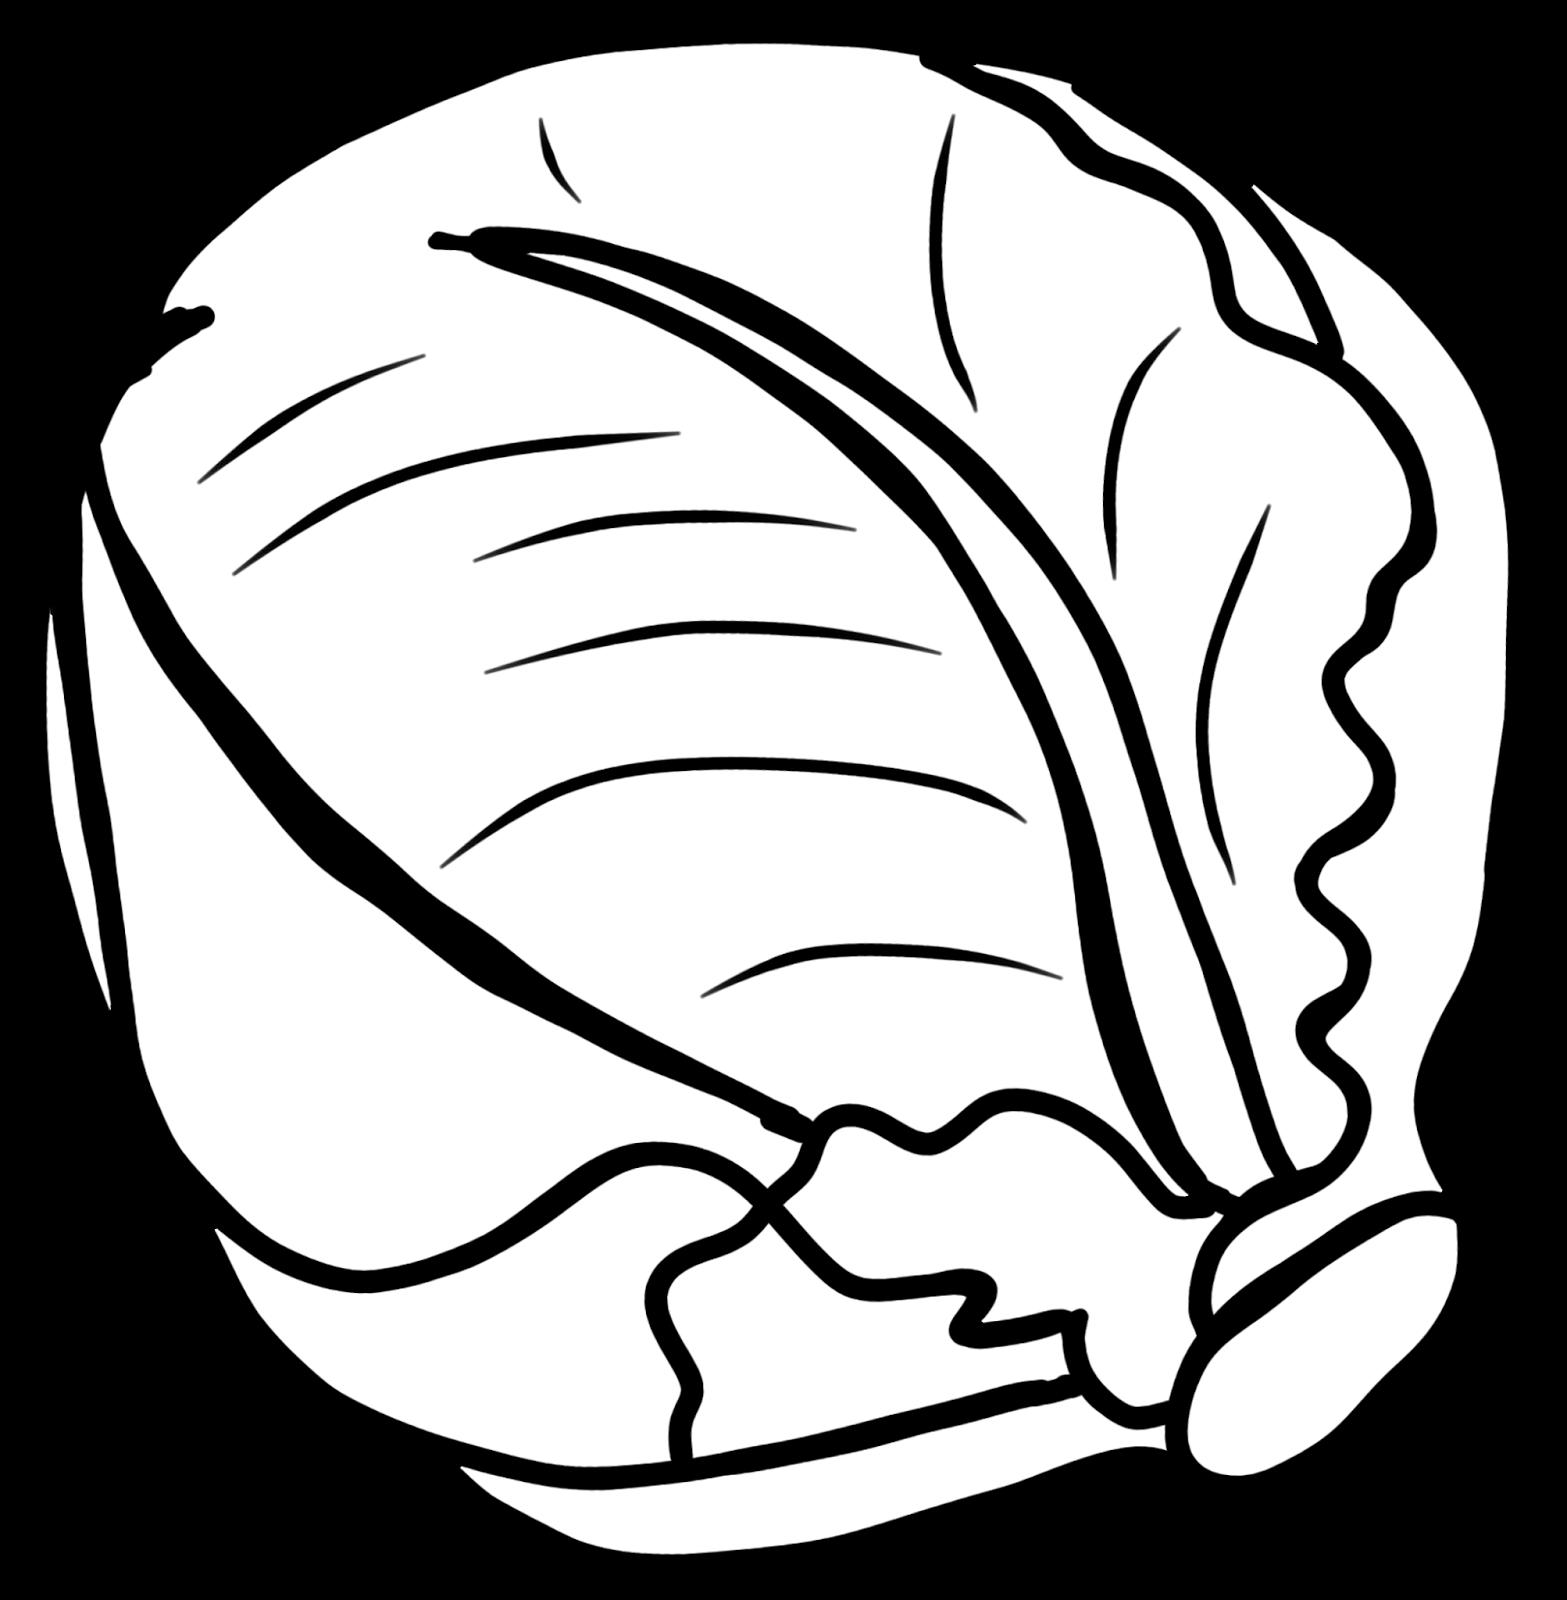 1567x1600 Vegetables Black White Basket Of Vegetables Clipart Black